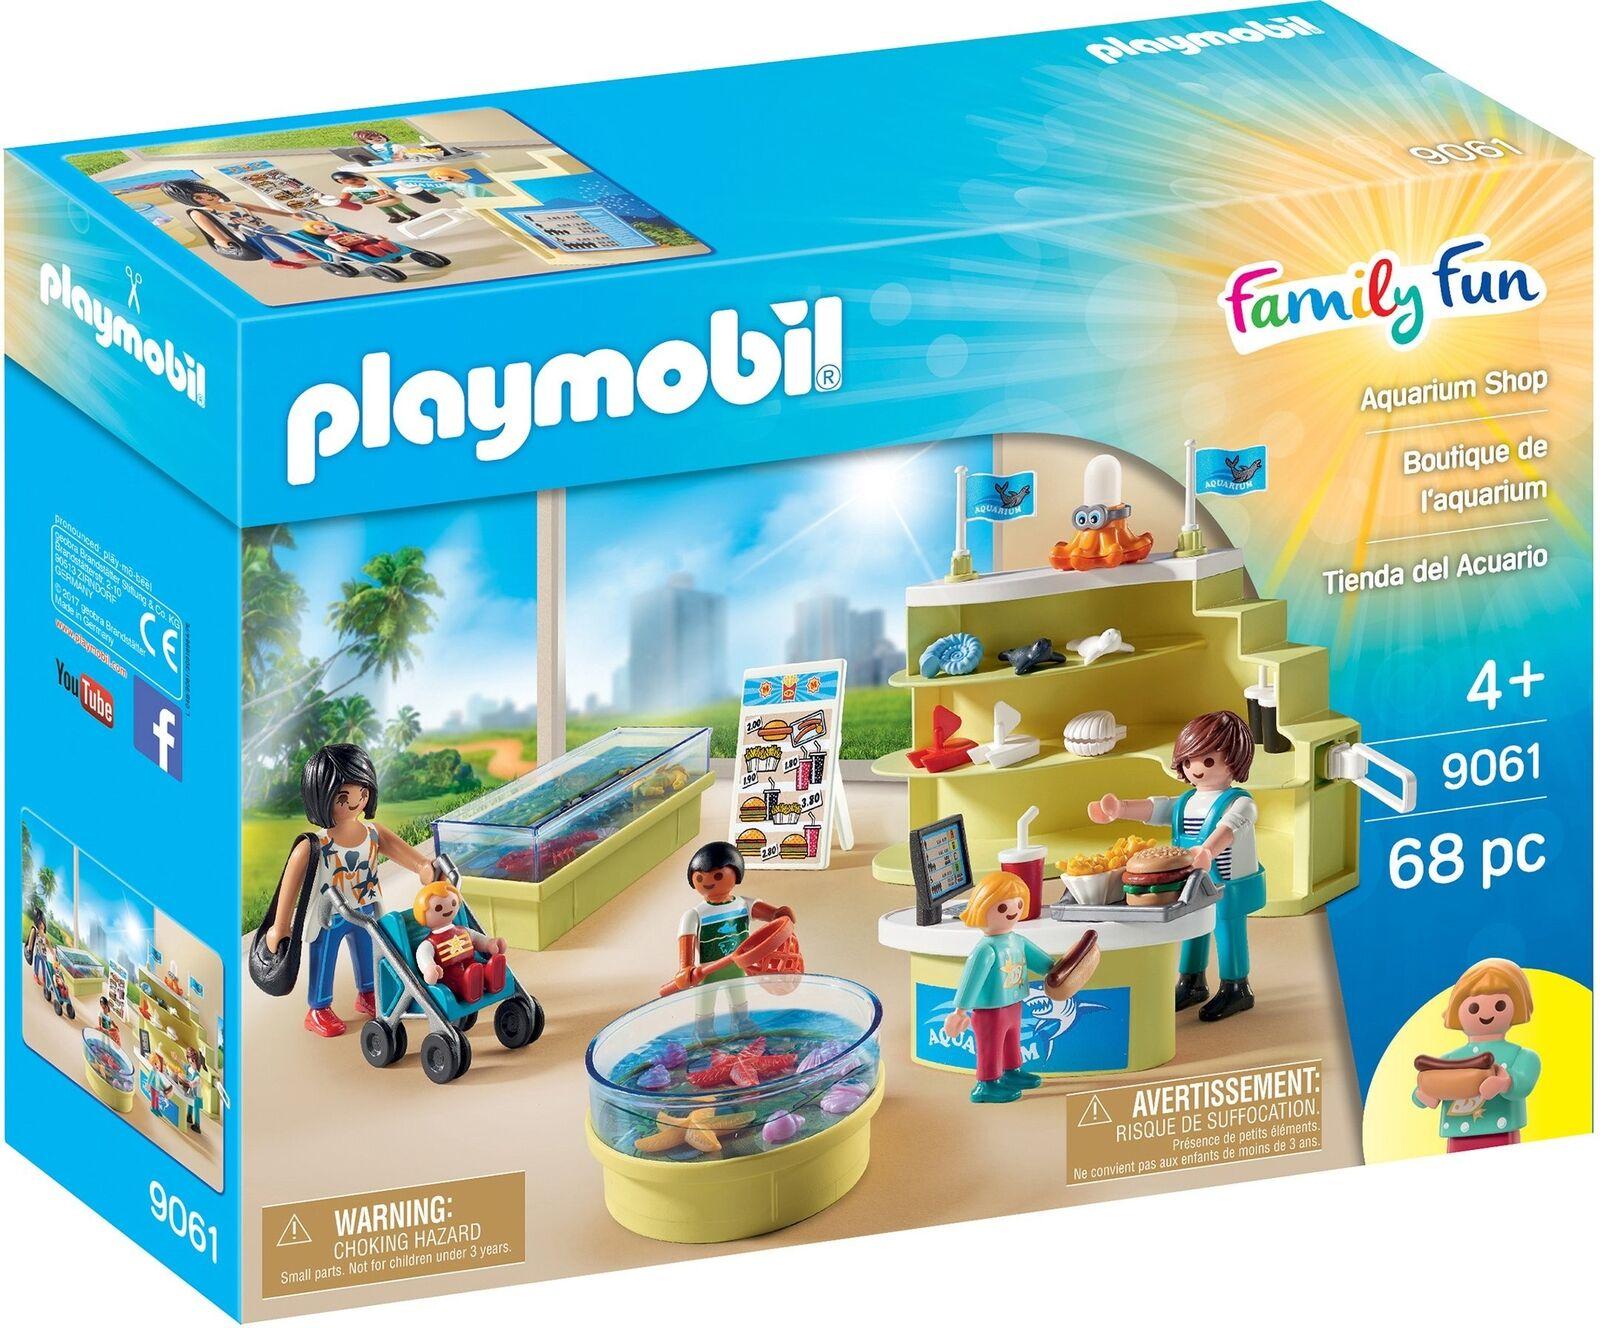 Playmobil 9061 Family Fun Aquarium Aquarium Aquarium Shop 7d27aa